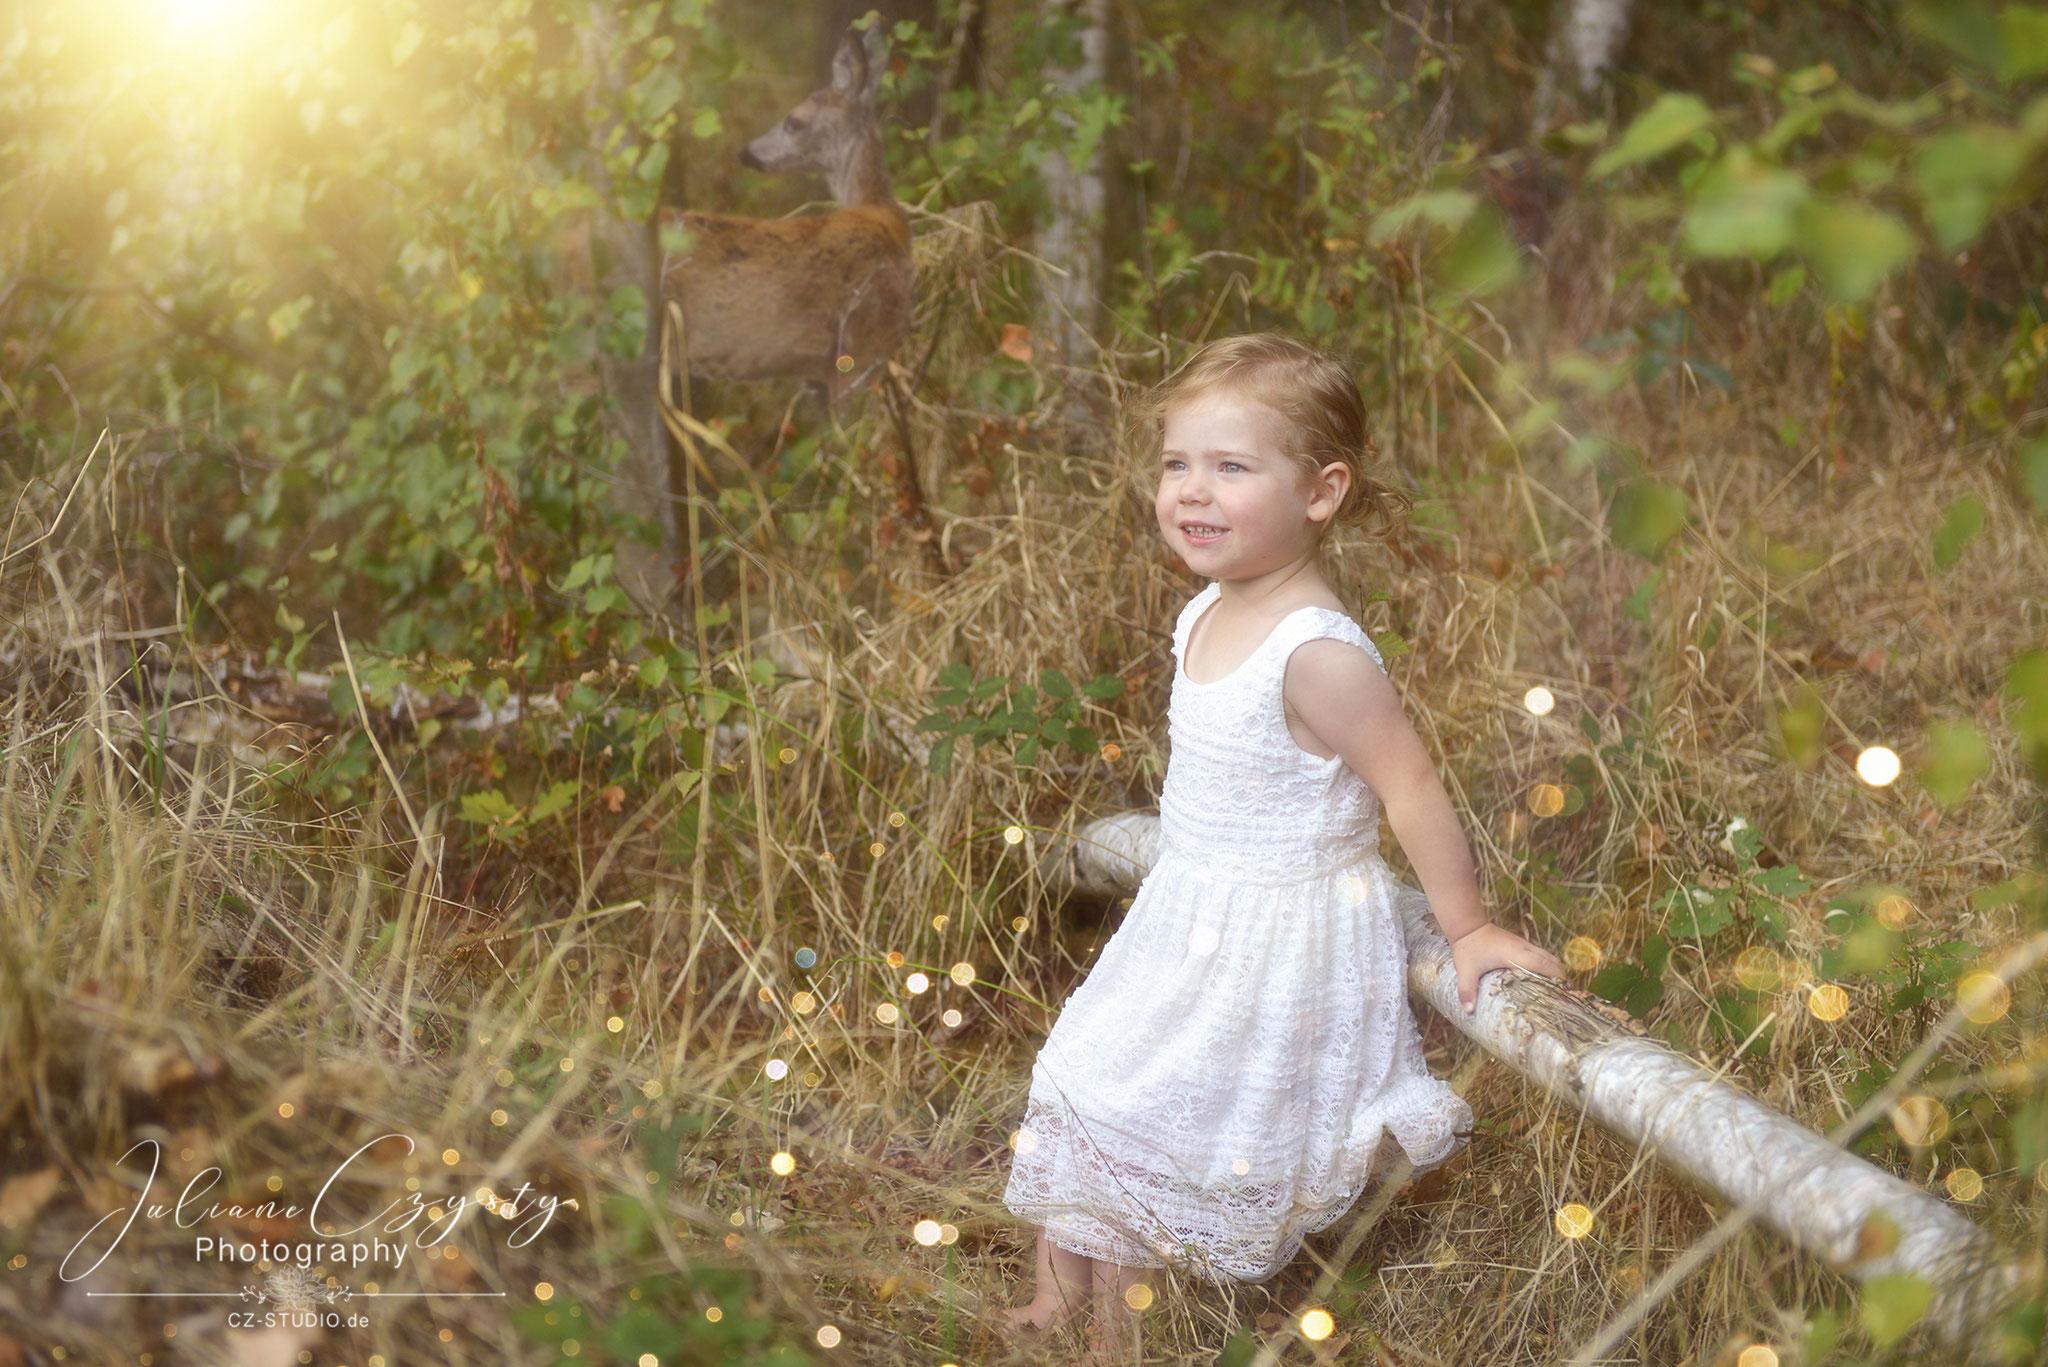 Outdoor Kinder Portraits - Juliane Czysty